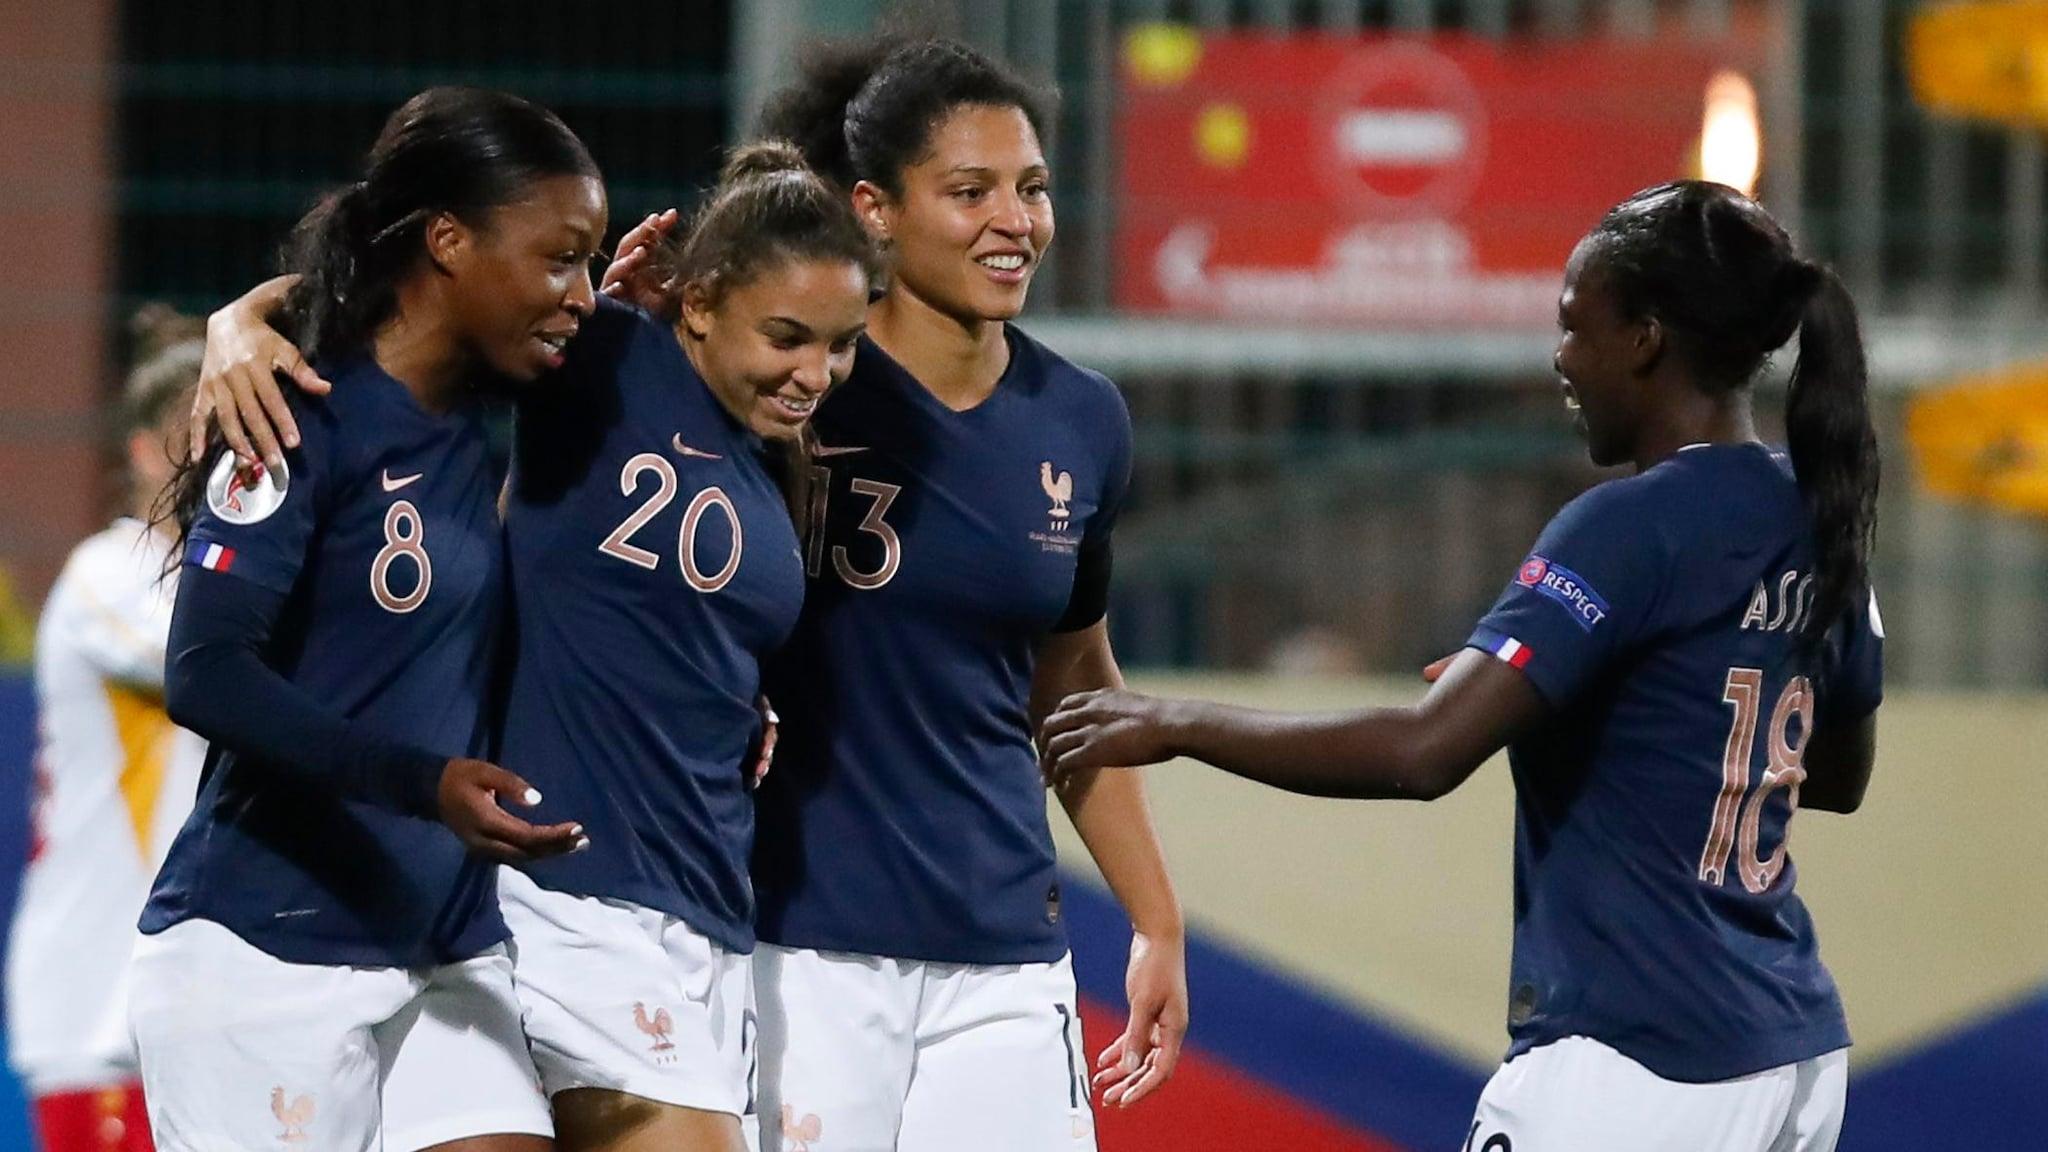 Resultado de imagen de women's euro 2022 logo